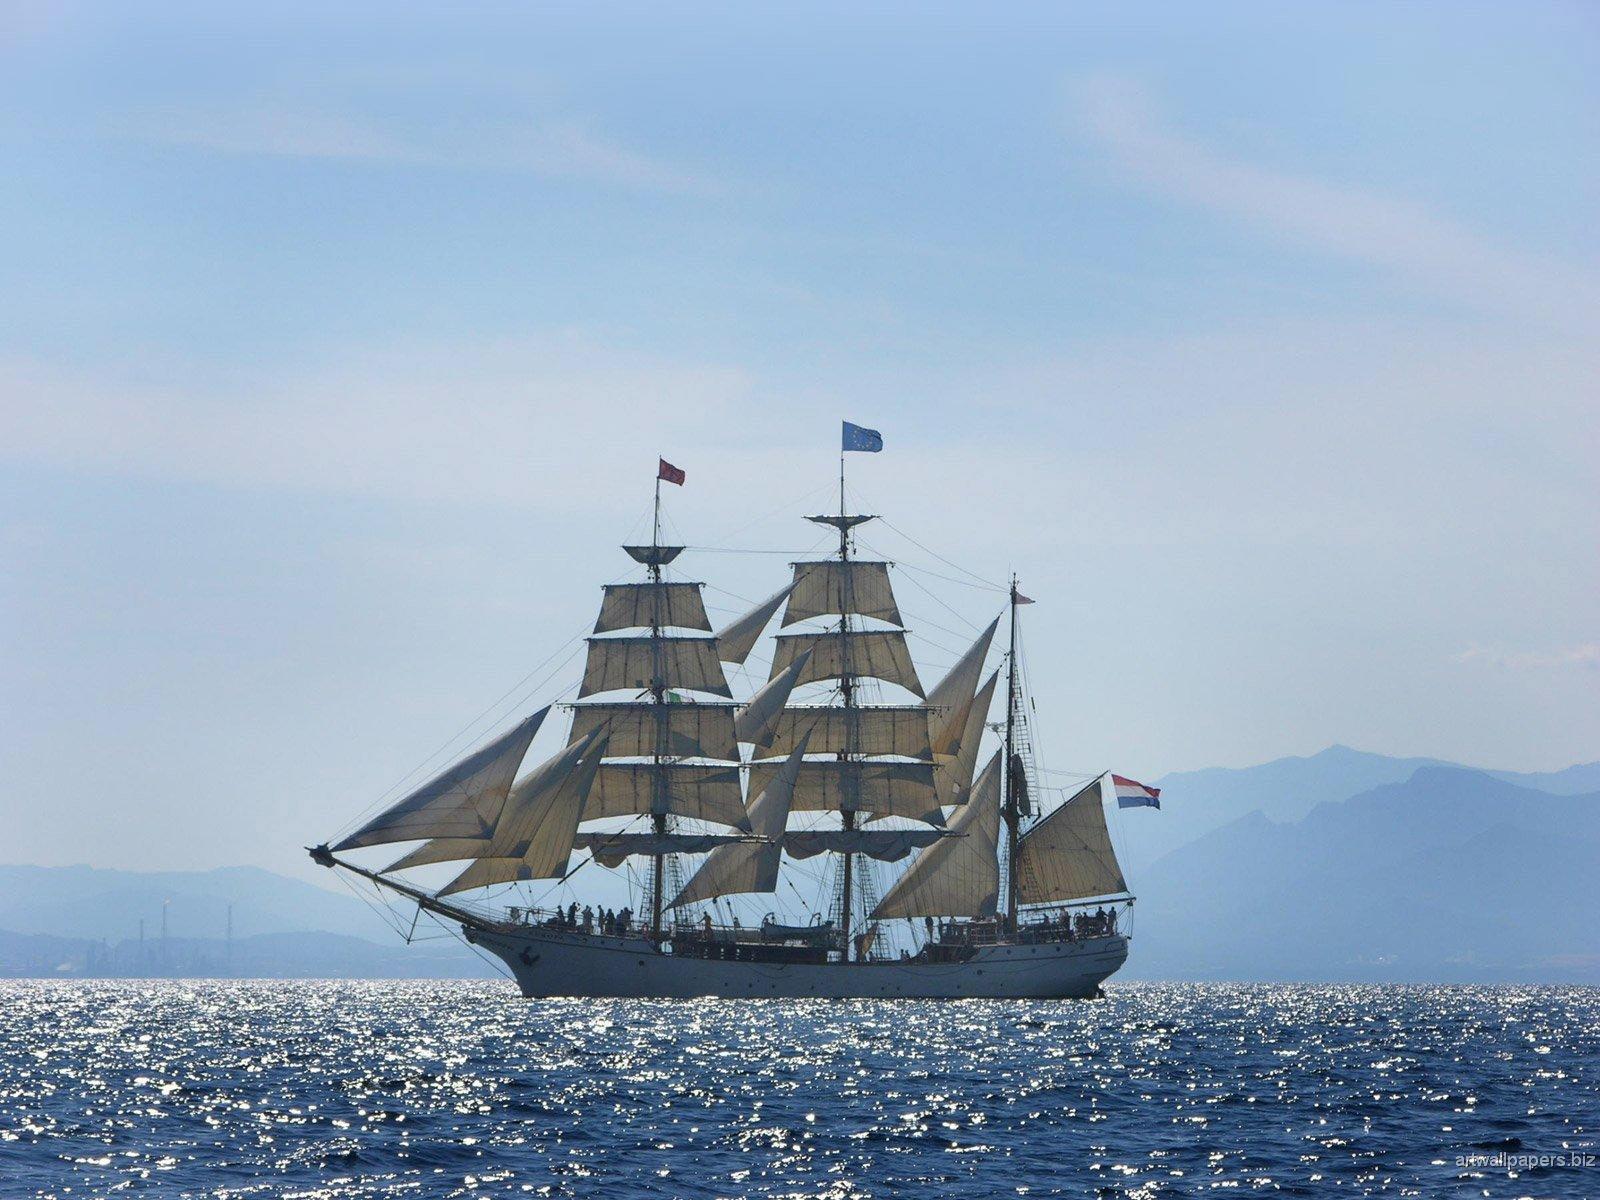 Wallpapers Ships Course Travel Ships Sailing Wallpaper Desktop 1600x1200